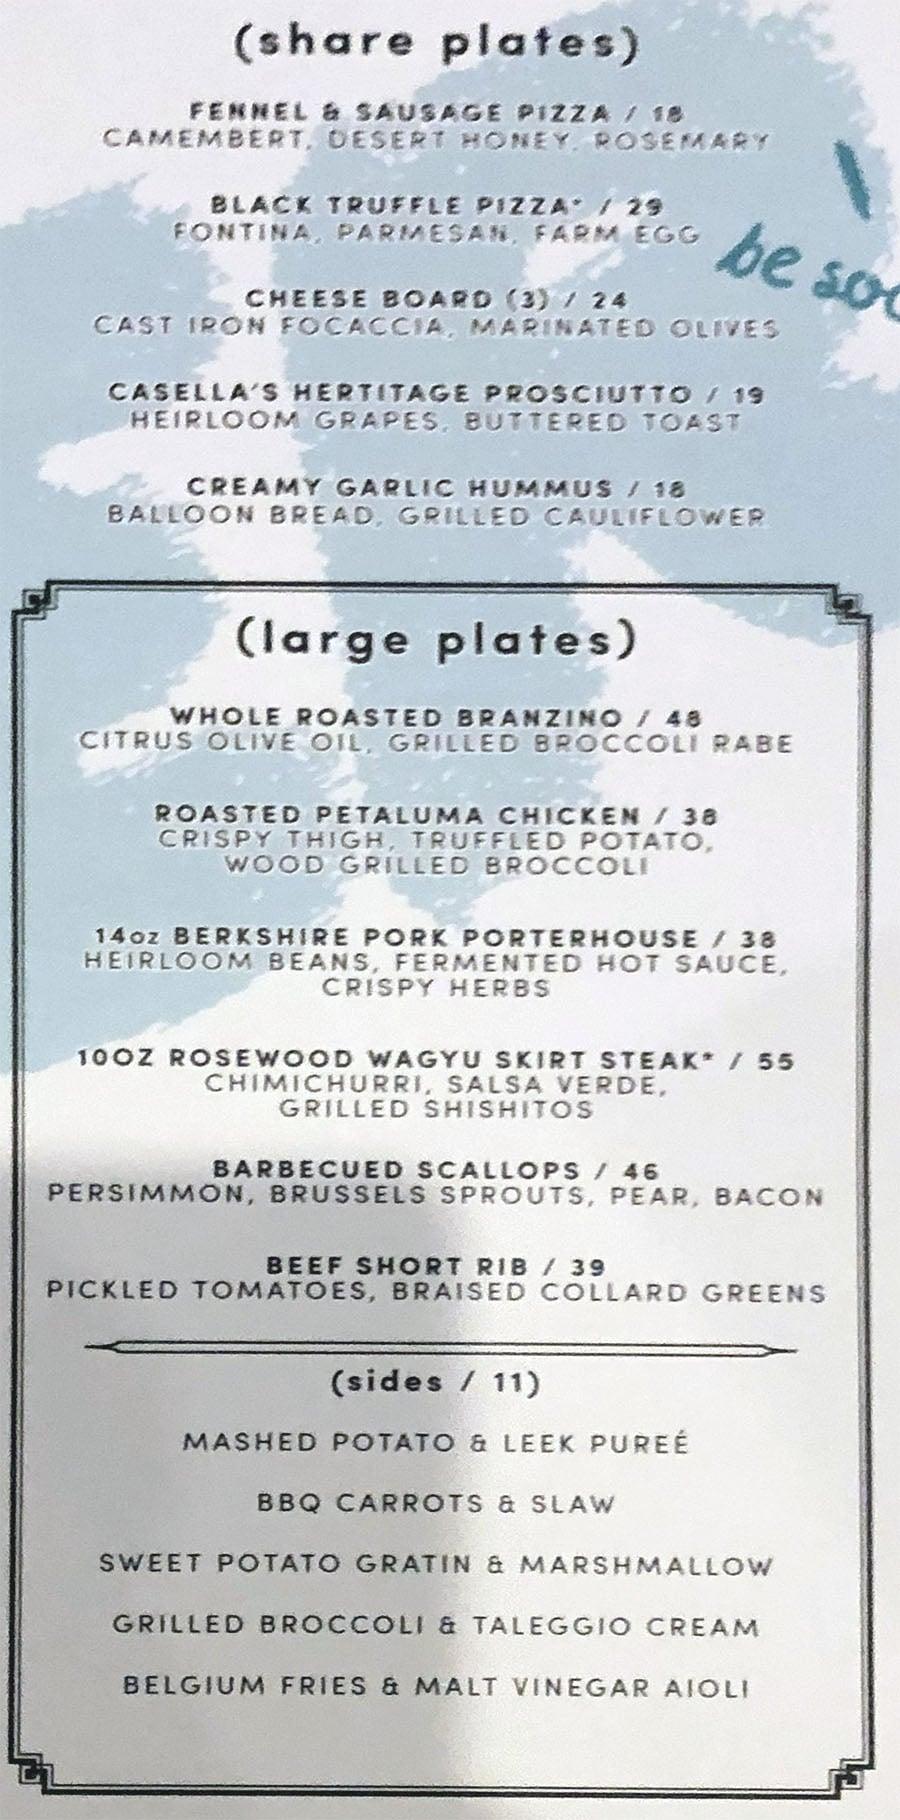 Libertine Social menu - share plates, large plates